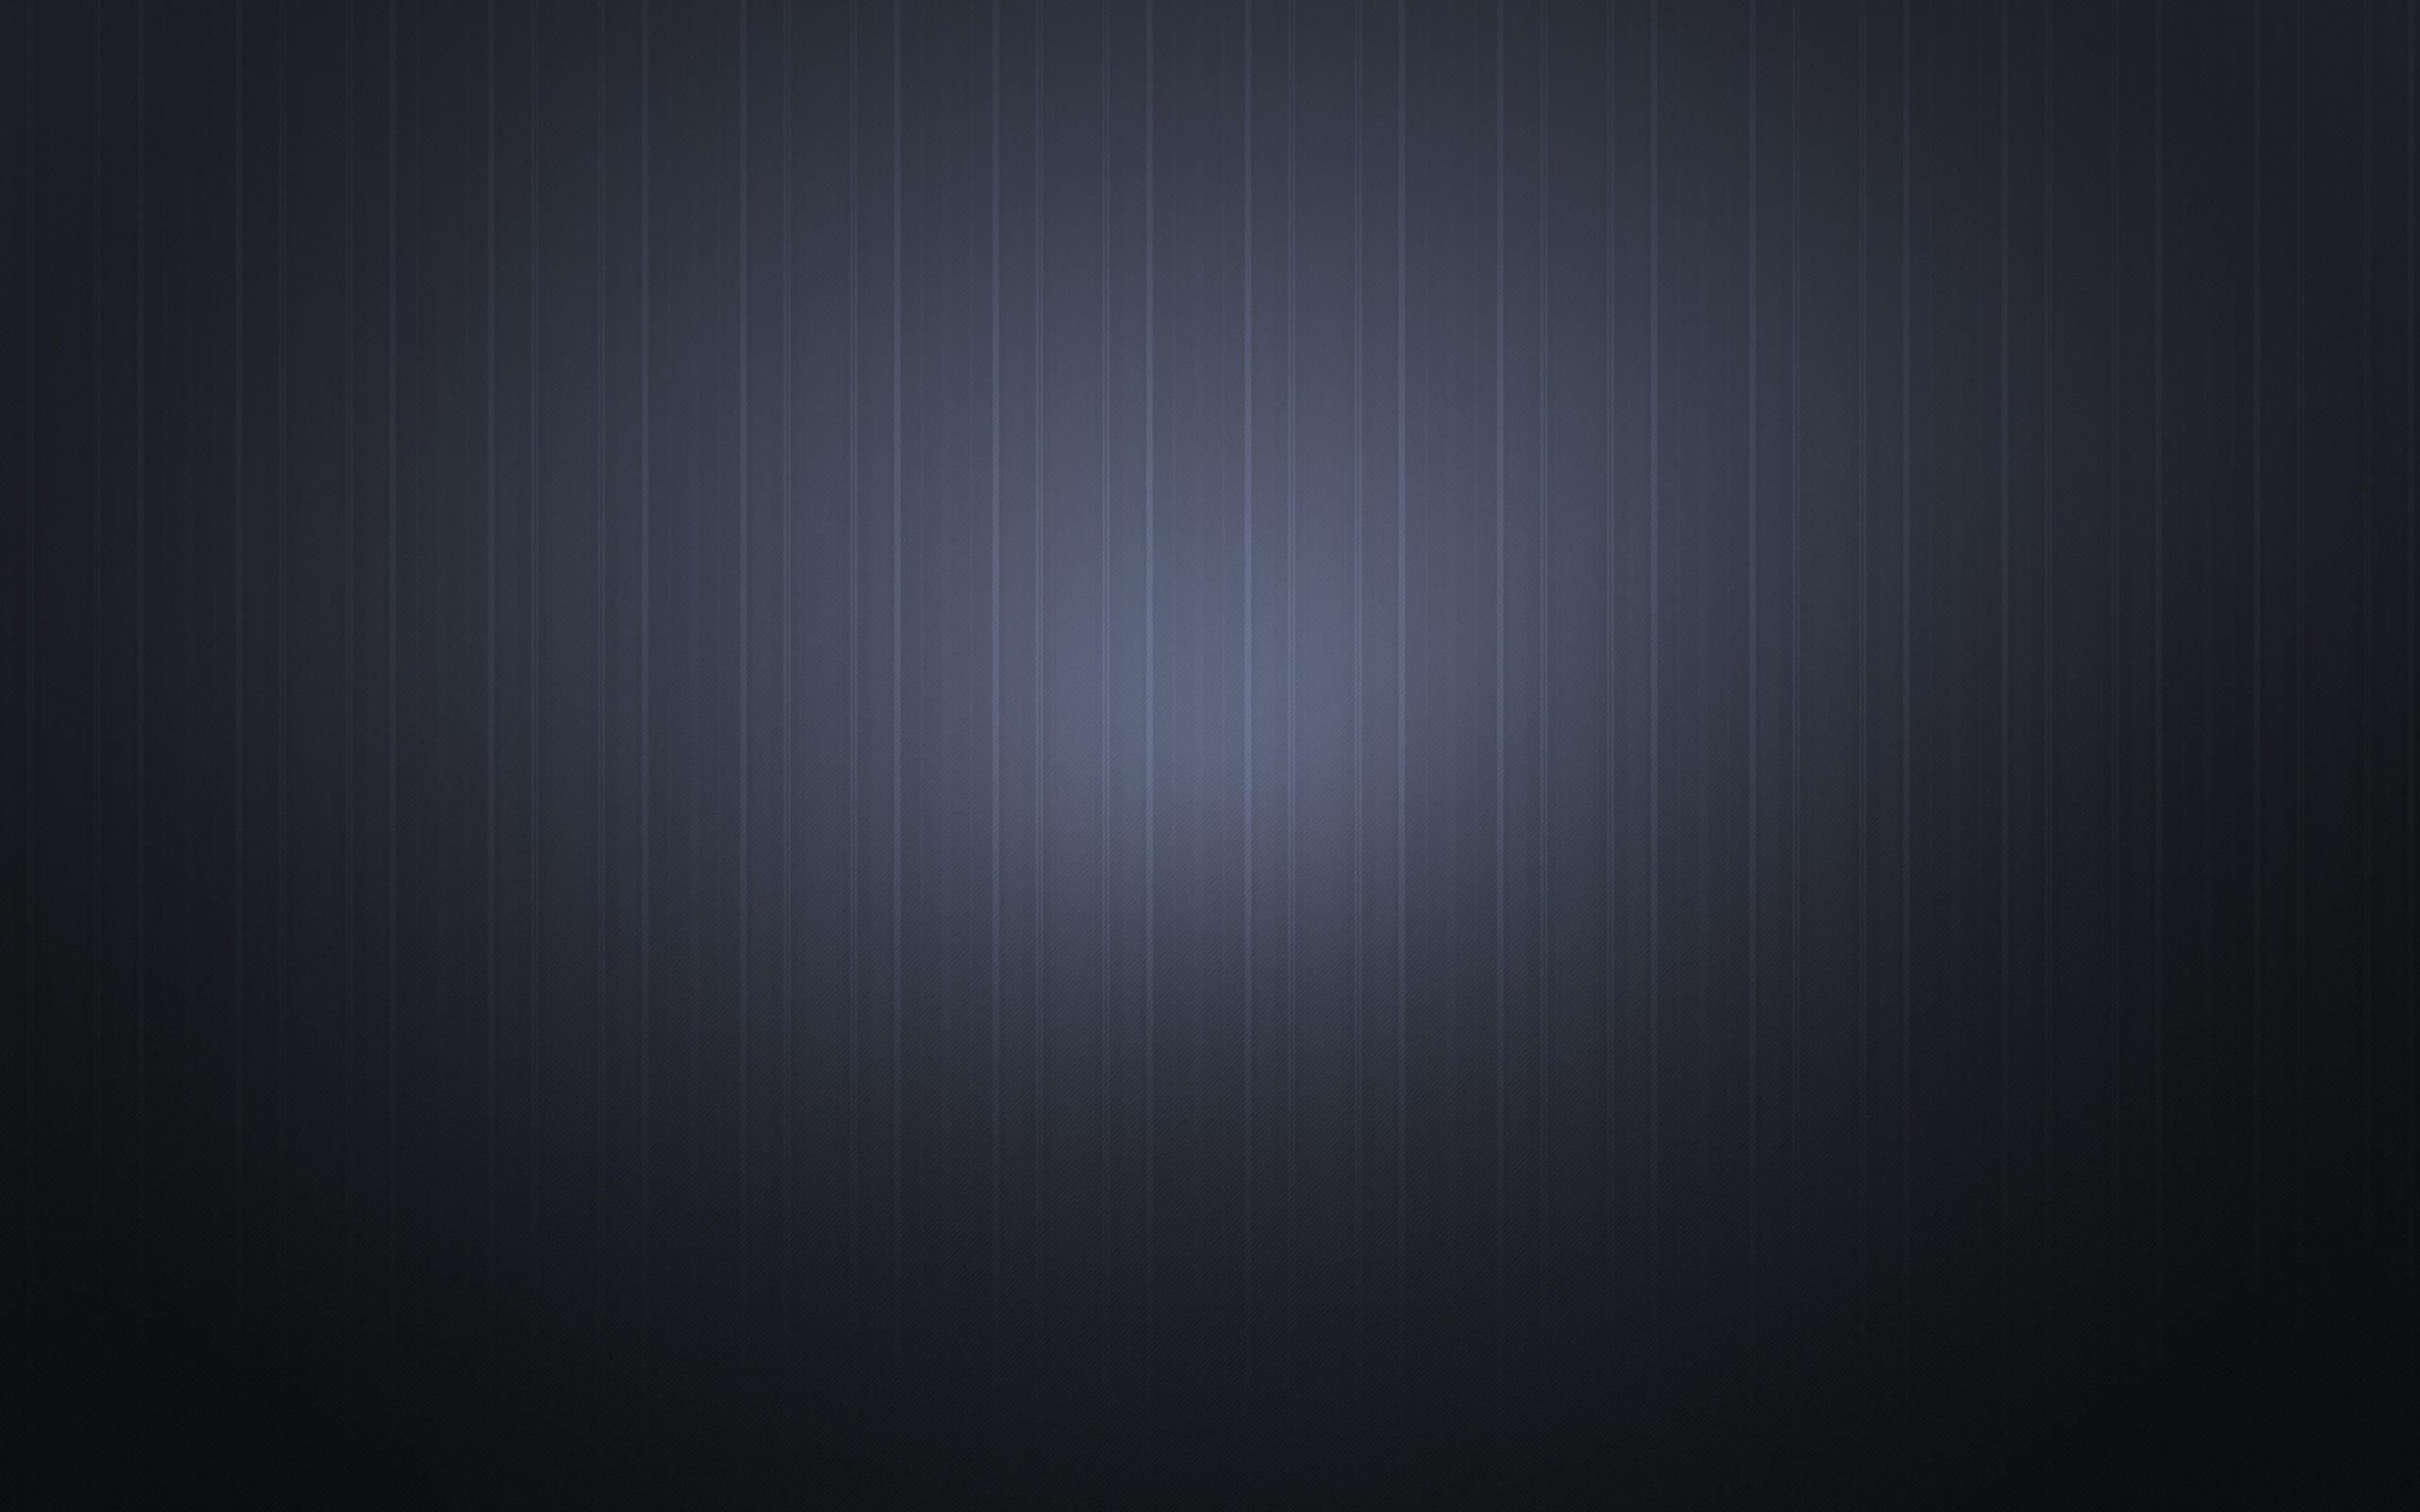 Gray background wallpaper wallpapersafari for Grey 3d wallpaper